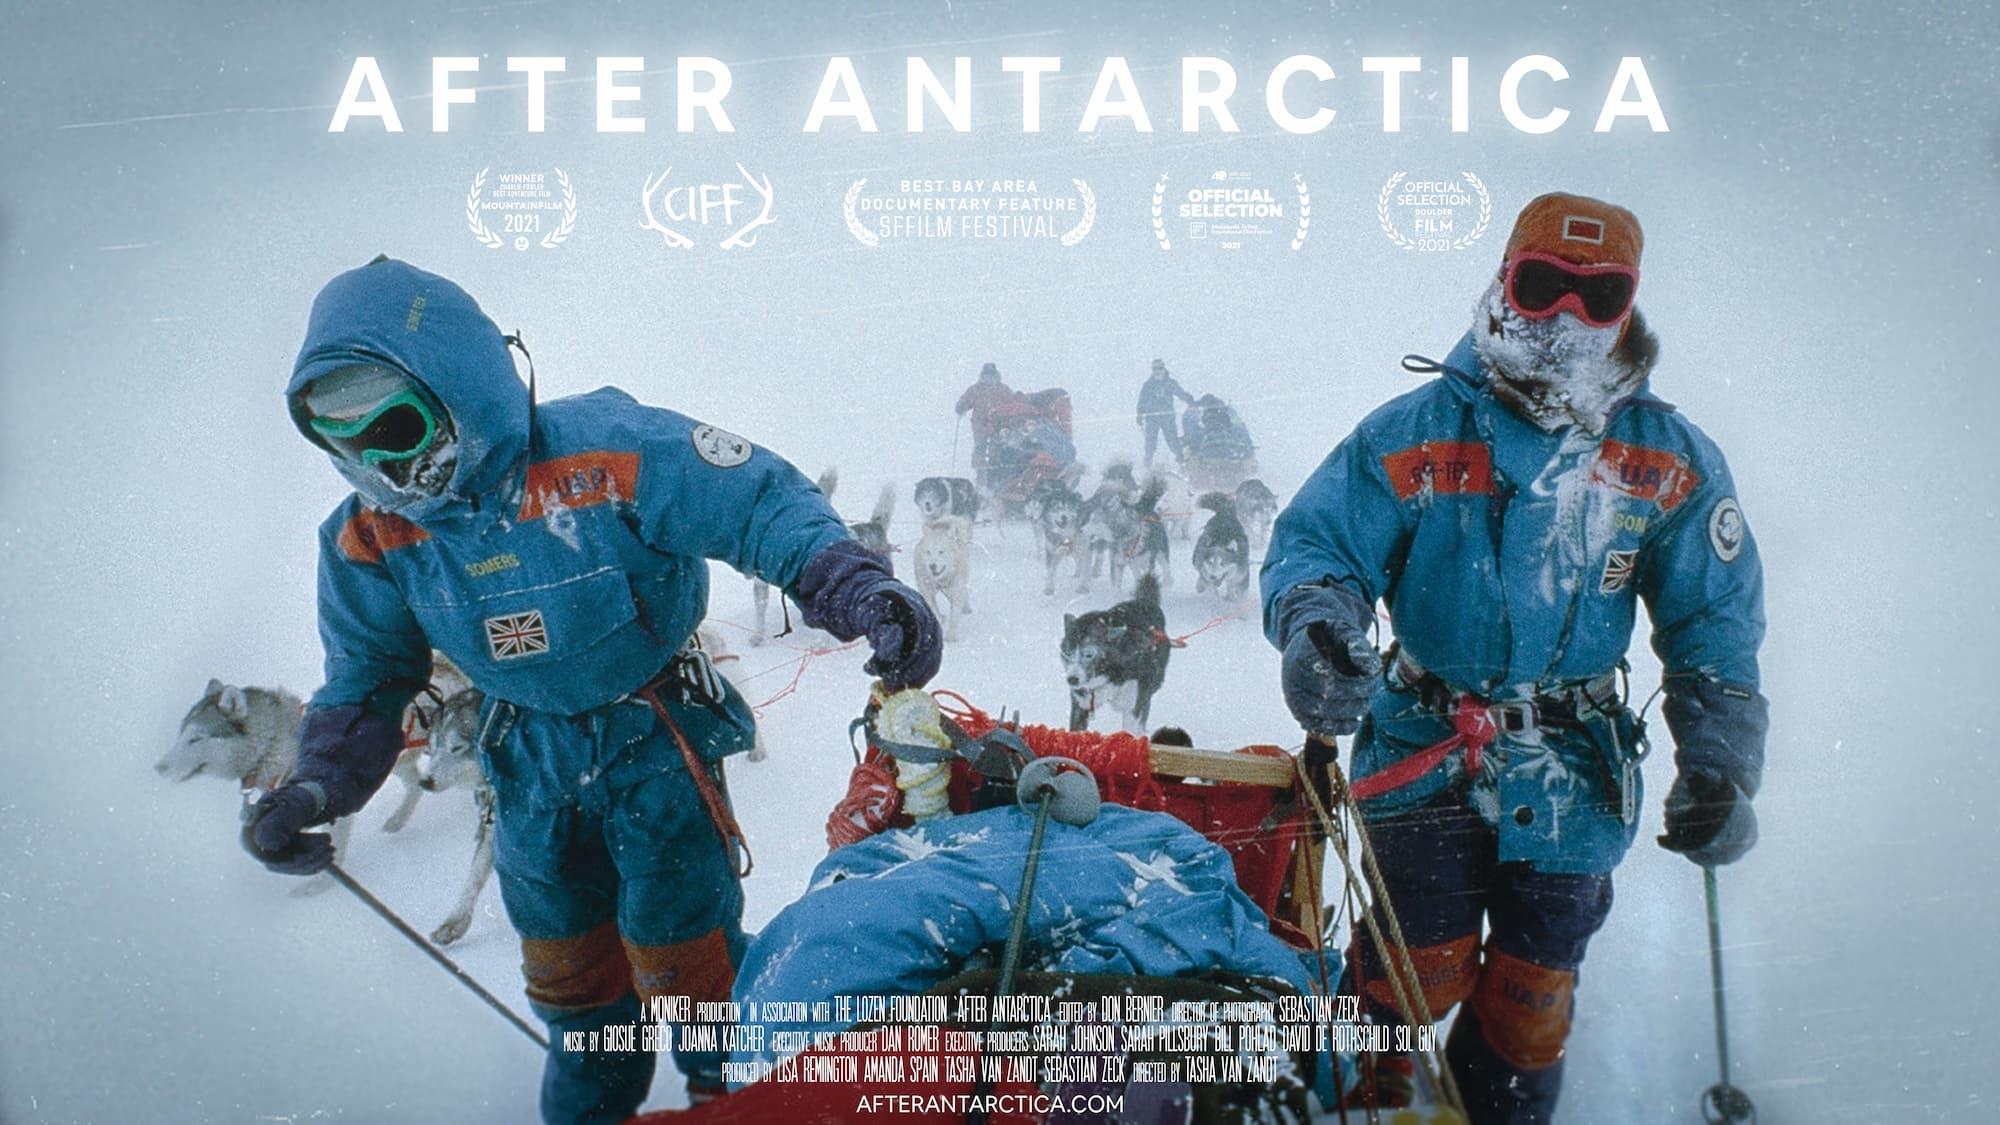 After Antarctica